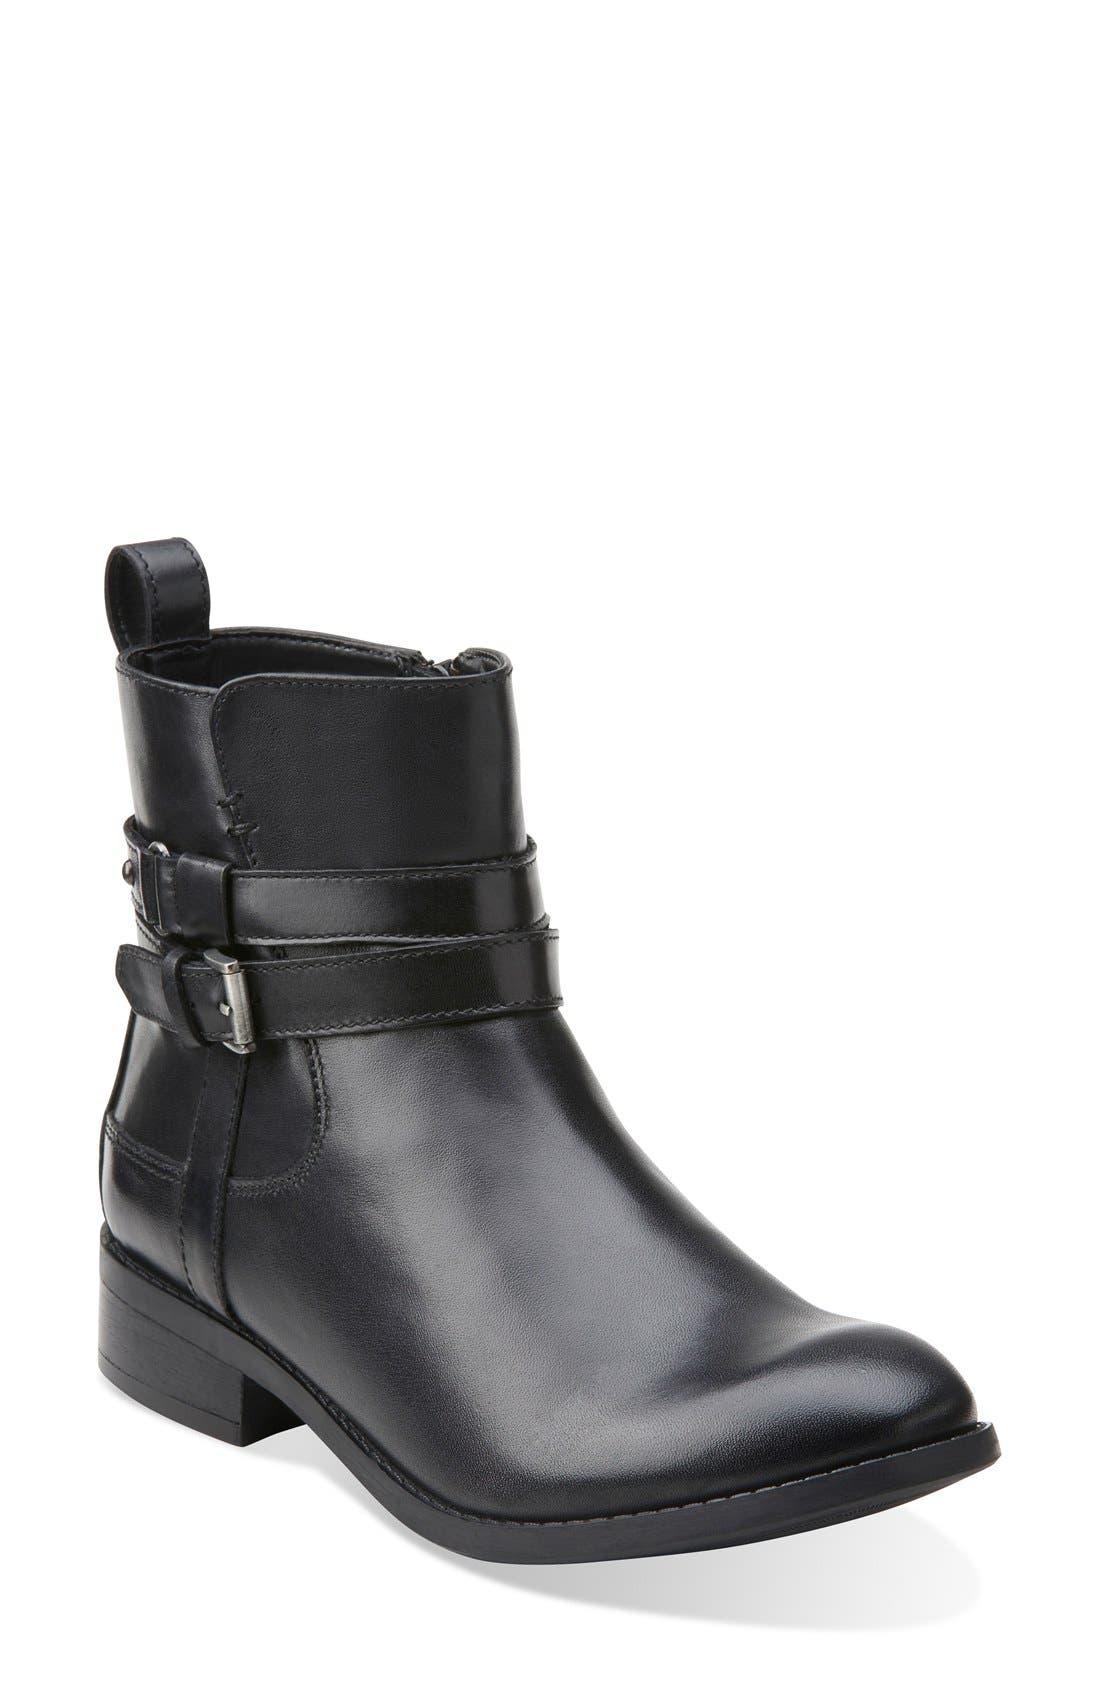 Alternate Image 1 Selected - Clarks® 'Pita Austin' WaterproofAnkle Boot (Women)